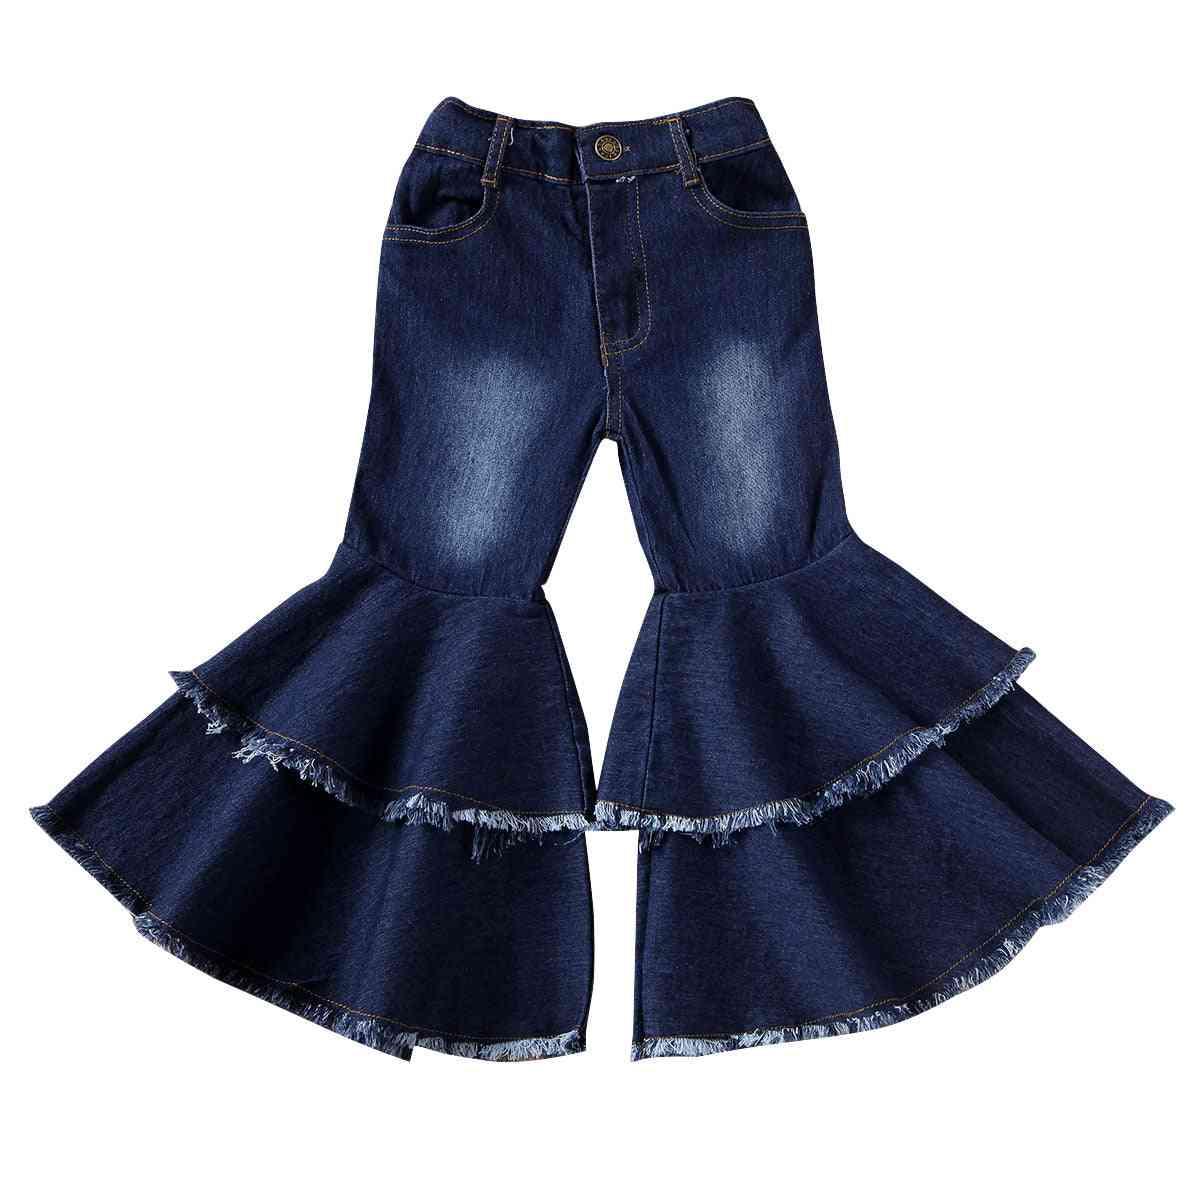 Child Denim Pants Stretch Elastic Jeans Bell Bottom Harem Pants